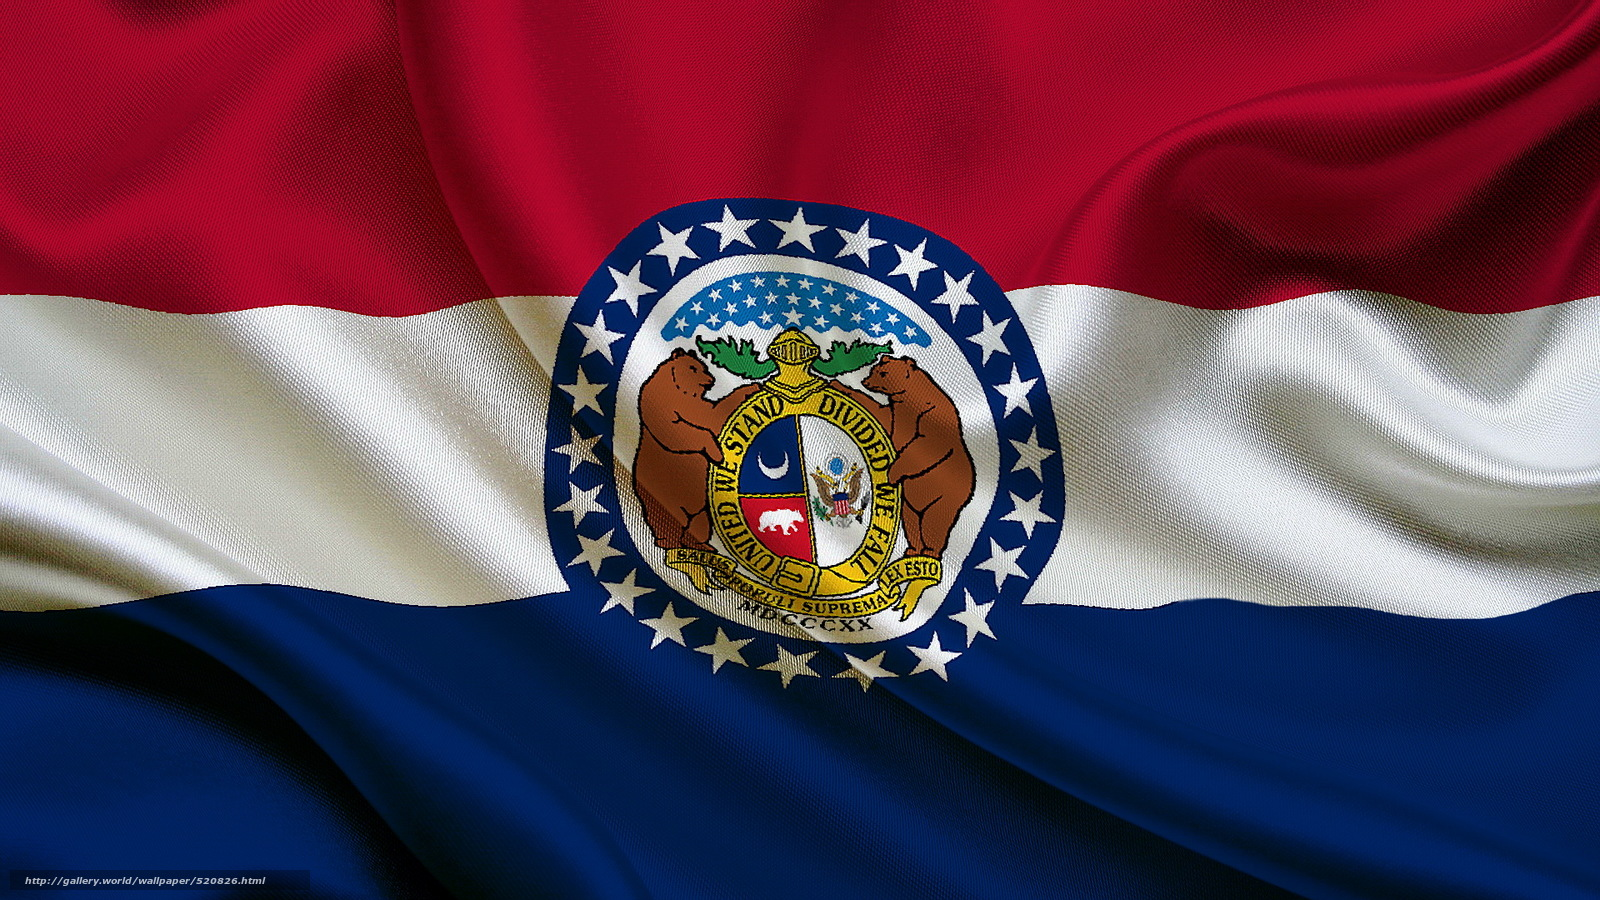 wallpaper flag State Missouri state flag of missouri desktop 1600x900